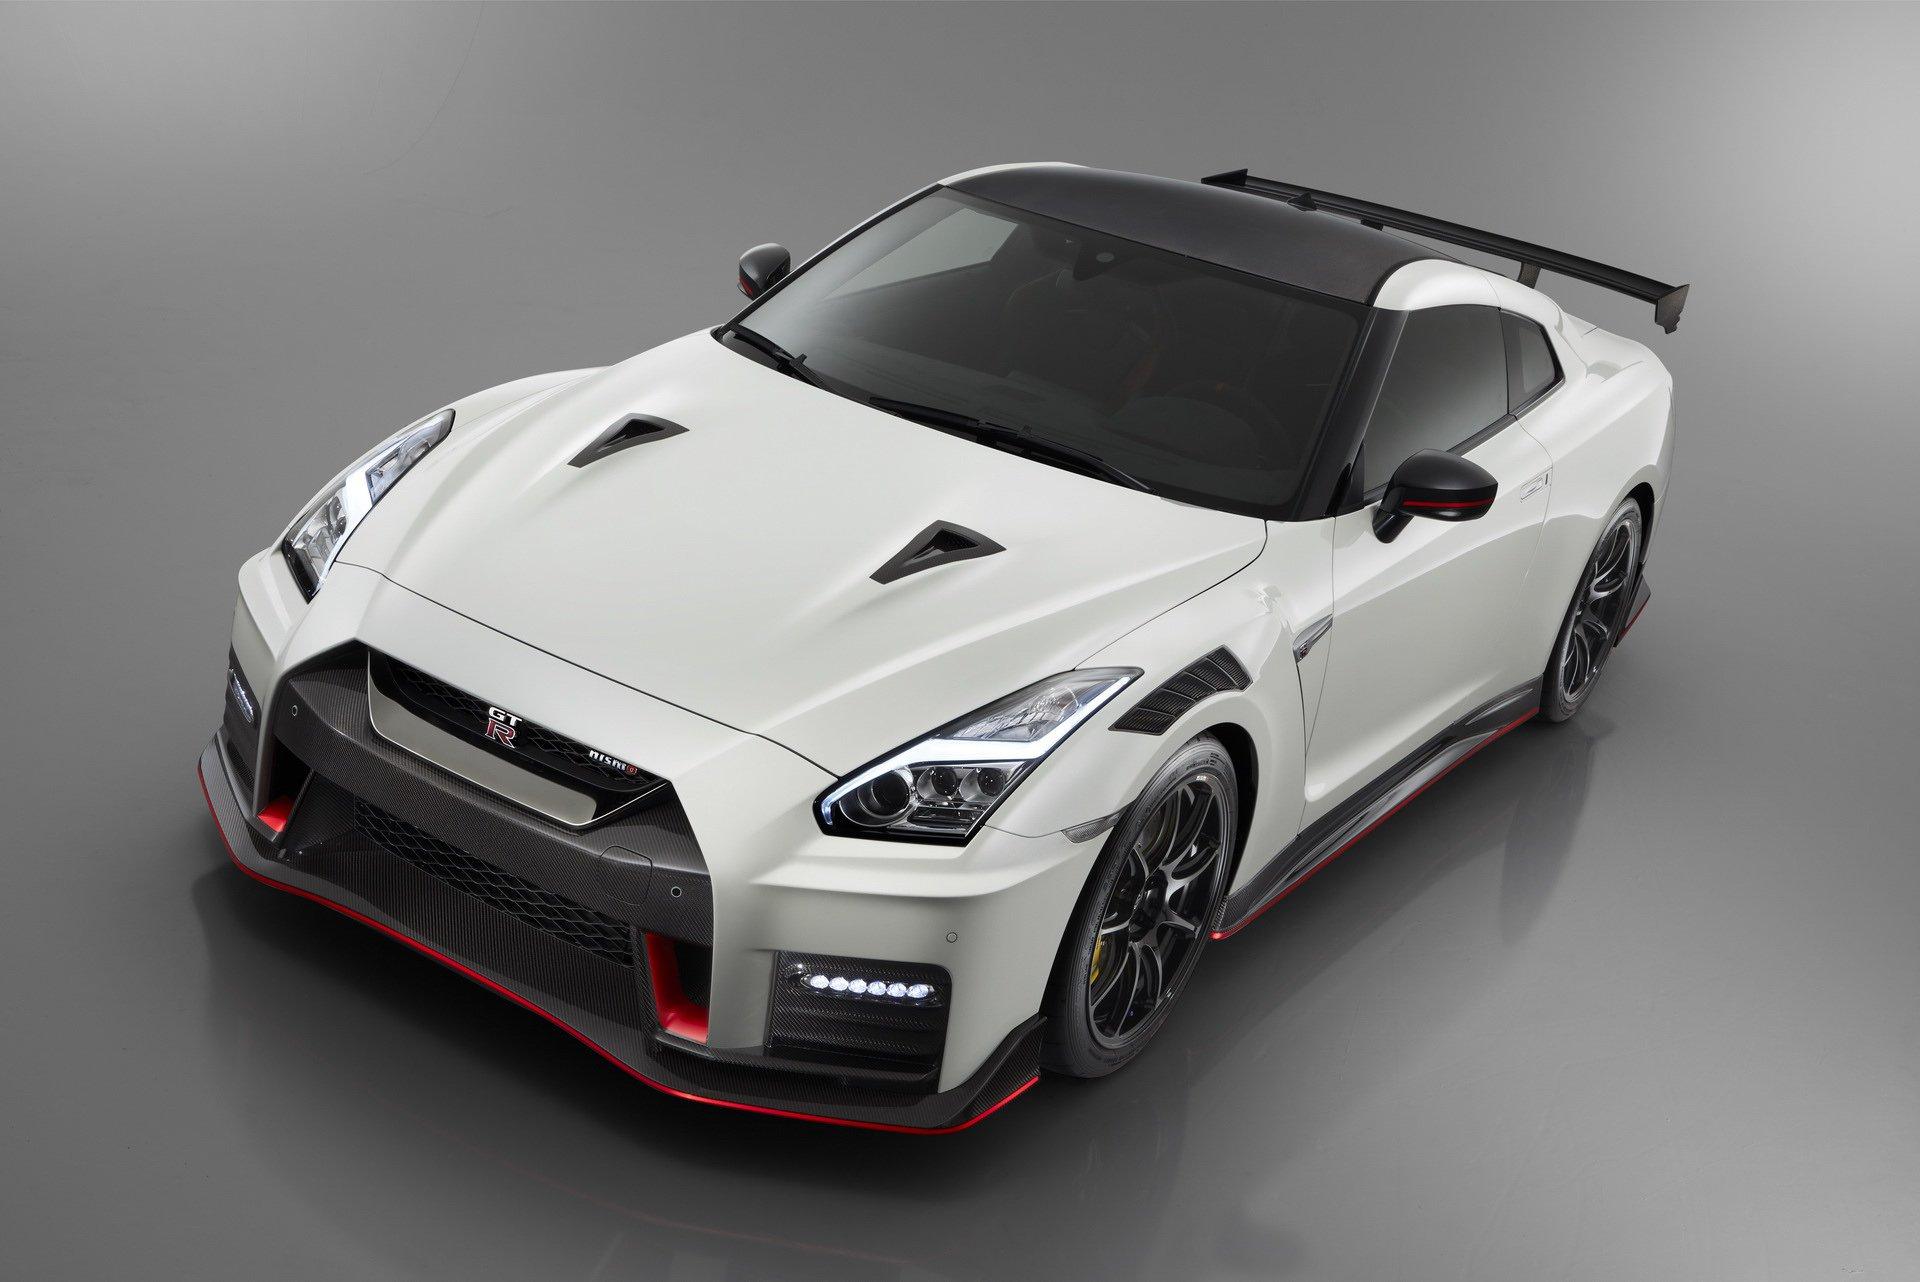 Nissan-GT-R-Nismo-2020-12